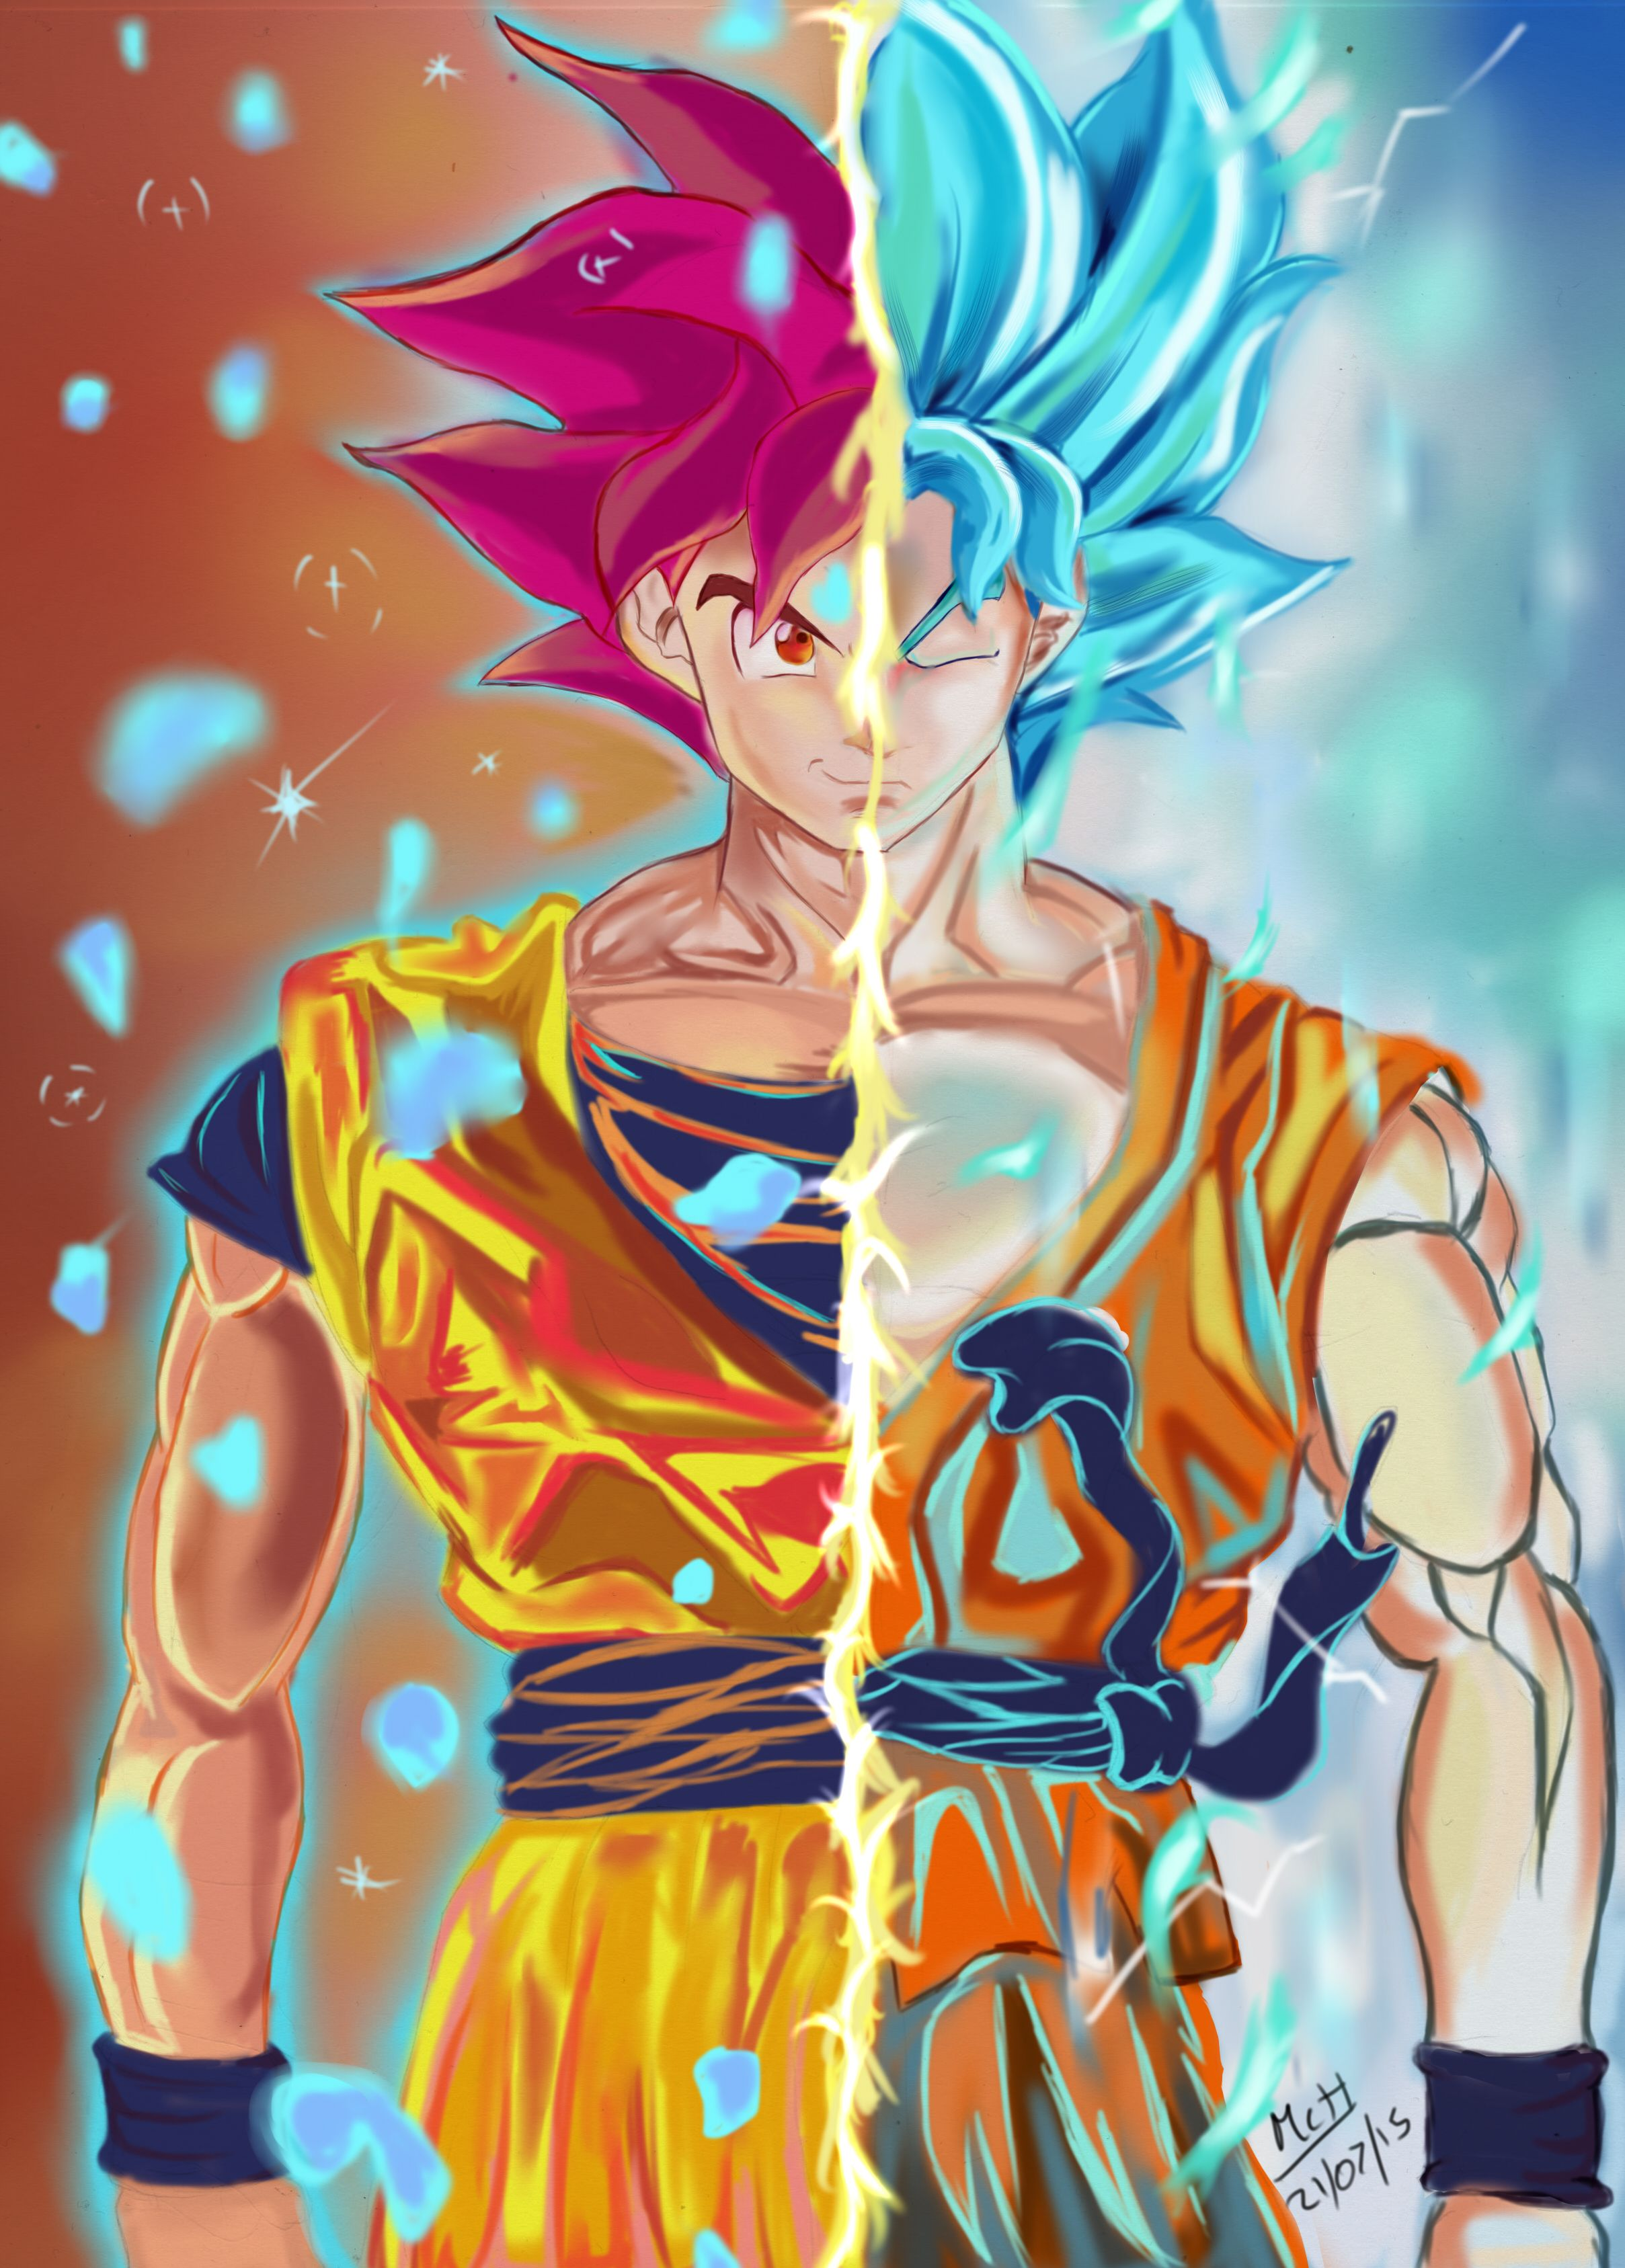 Capsule Corp 453844694 in addition Dragon Ball Fusion 580400950 also Dragon Ball Super Z Hoodies Super Saiyan Blue Goku Kaio Ken Hoodie Dbz 3d Clothing additionally 1771475 Beautiful Sunset also 756534437373695254. on dbz tank